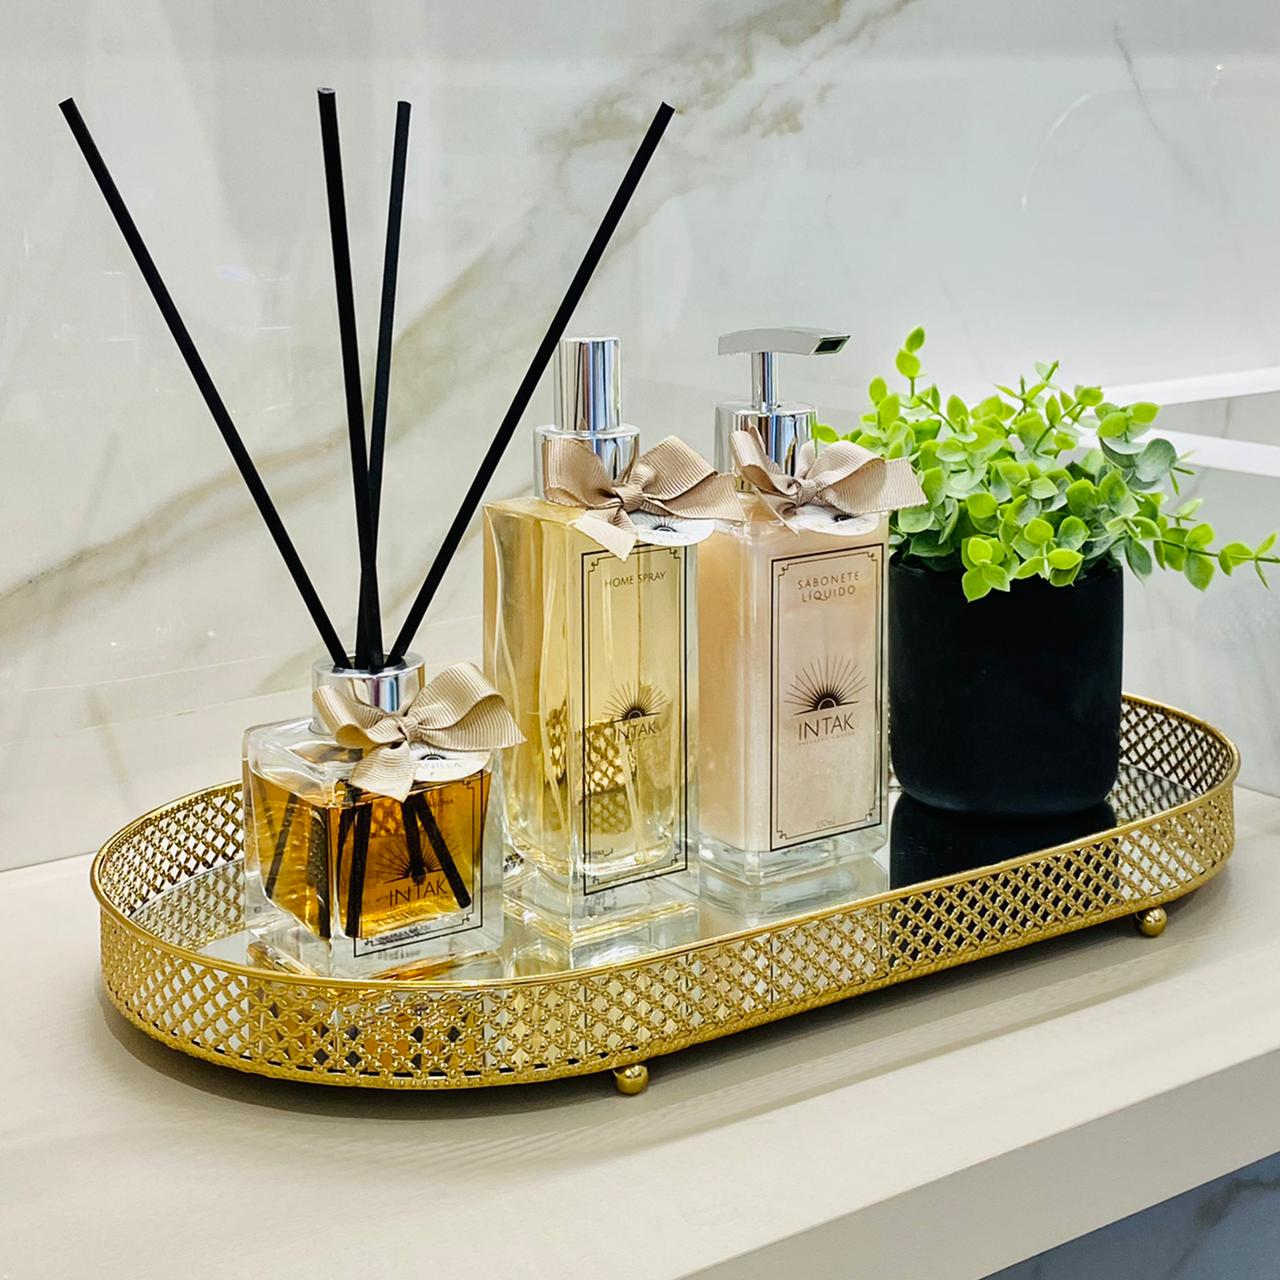 Kit Lavabo Bandeja Oval Dourada M com Vaso - Vanilla